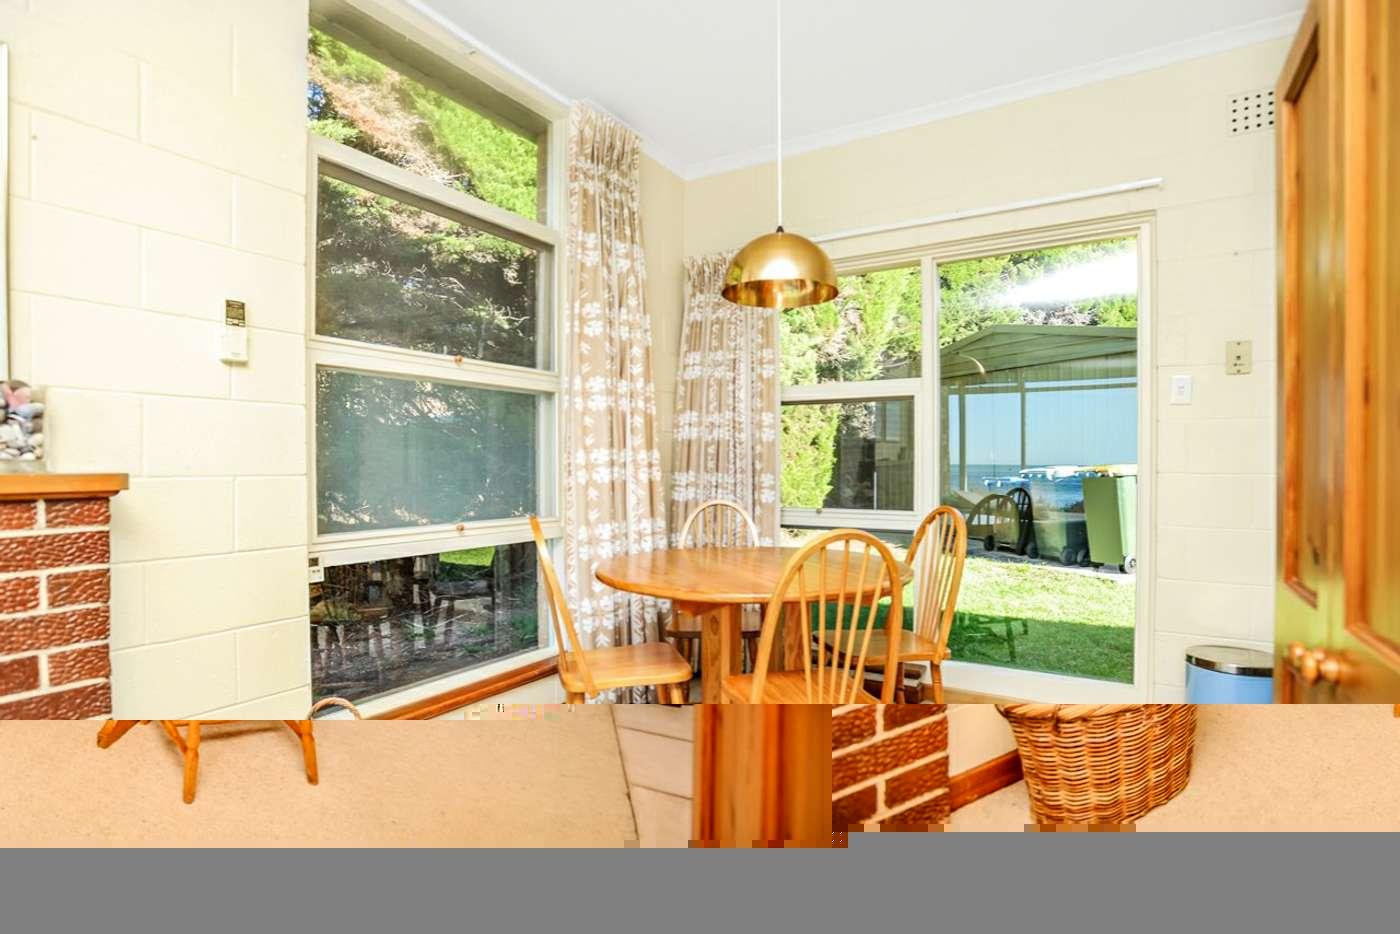 Sixth view of Homely house listing, 106 Franklin Parade, Encounter Bay SA 5211